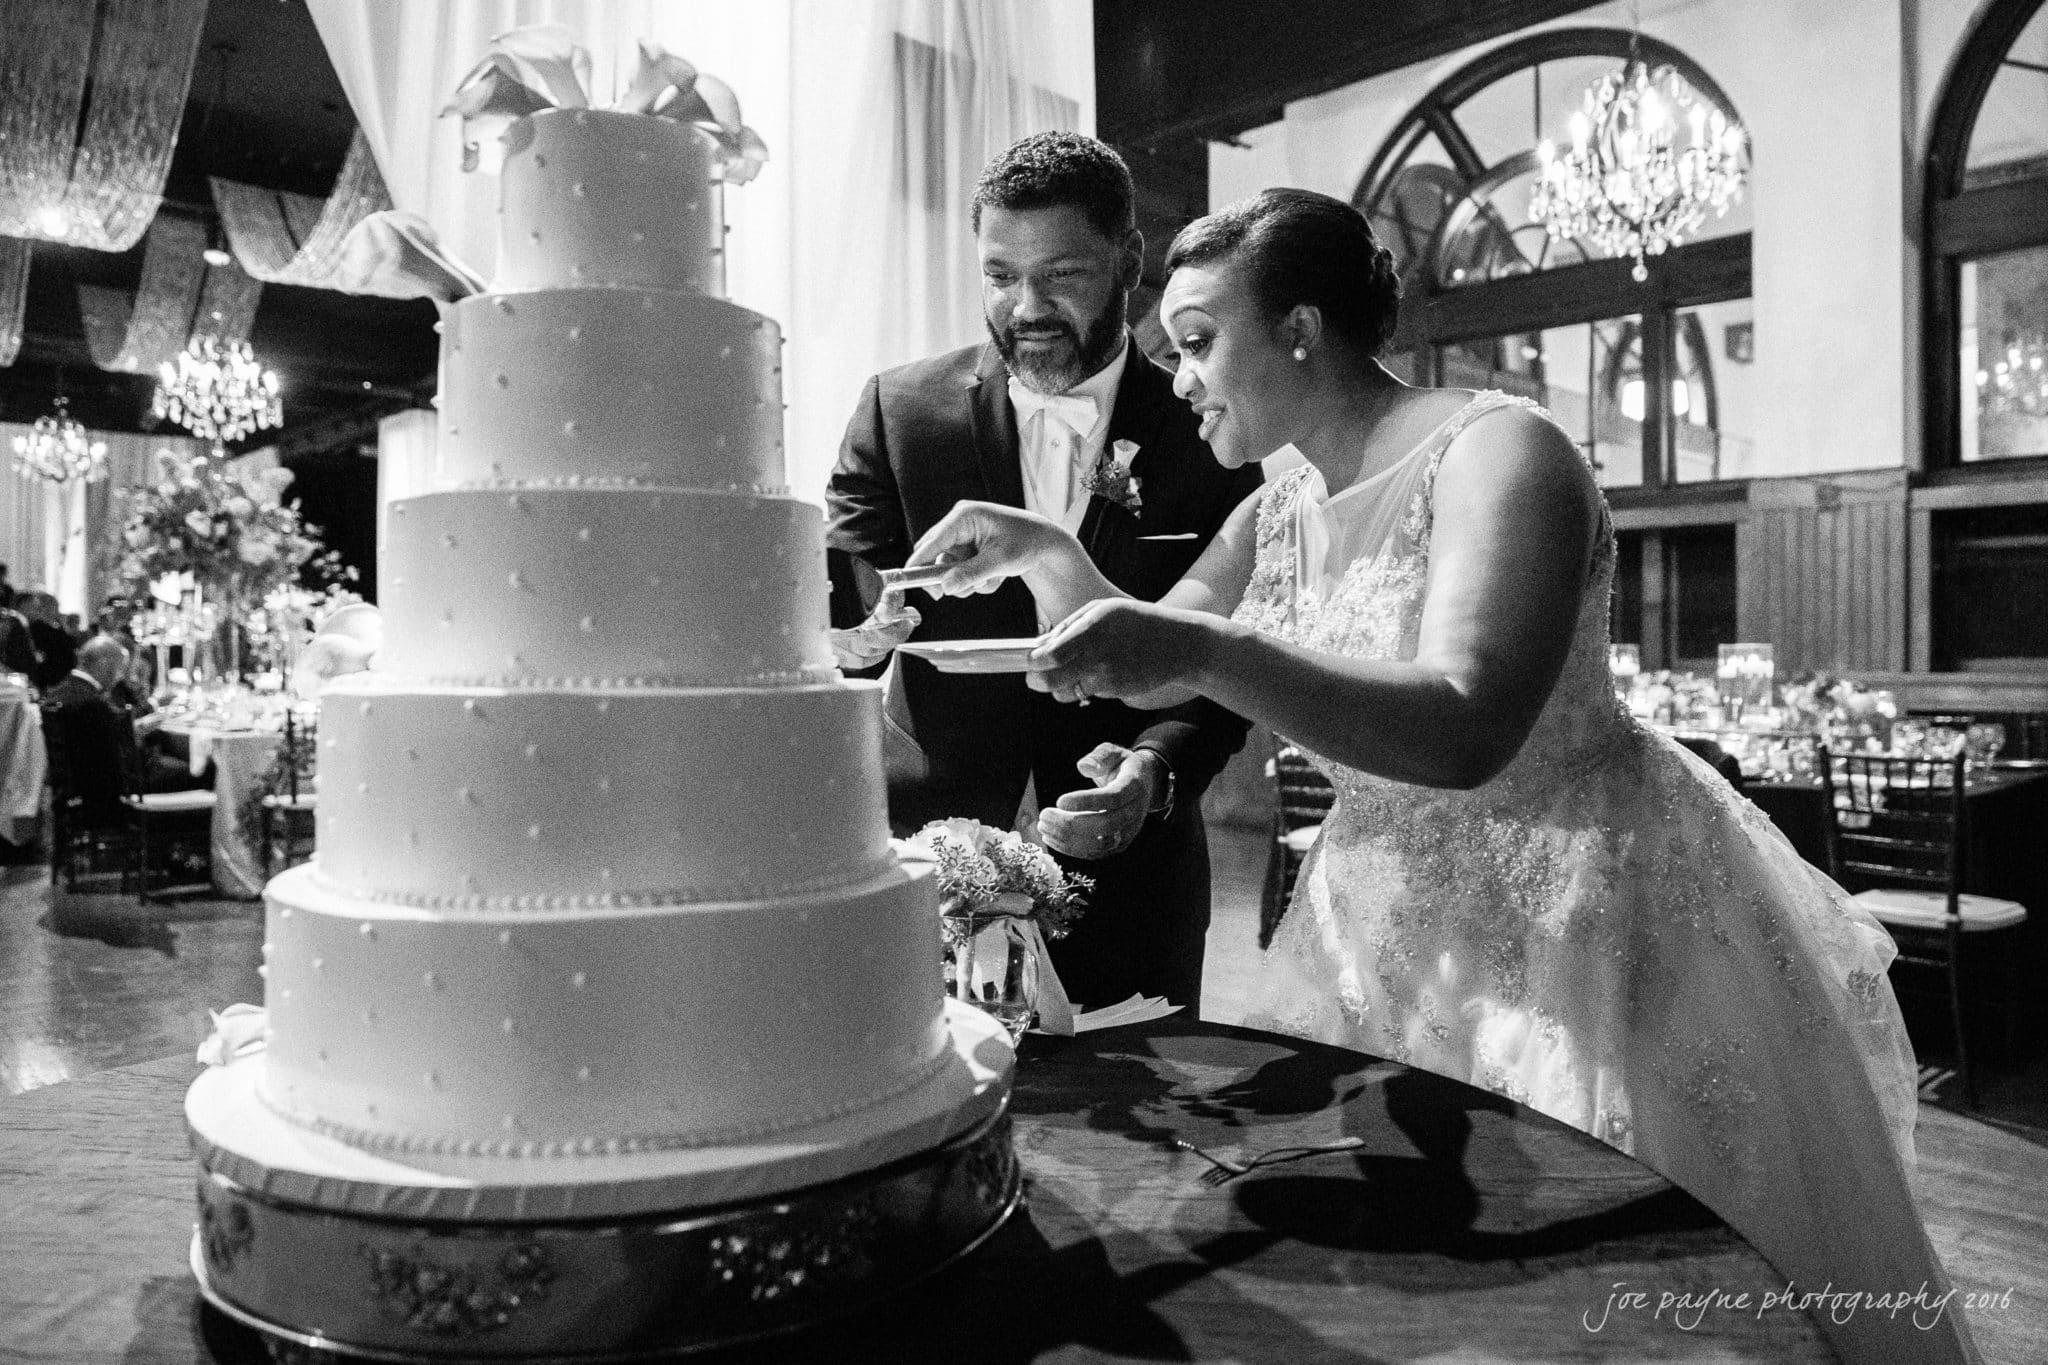 first-baptist-millennium-center-winston-salem-wedding-photography-toni-kevin-44